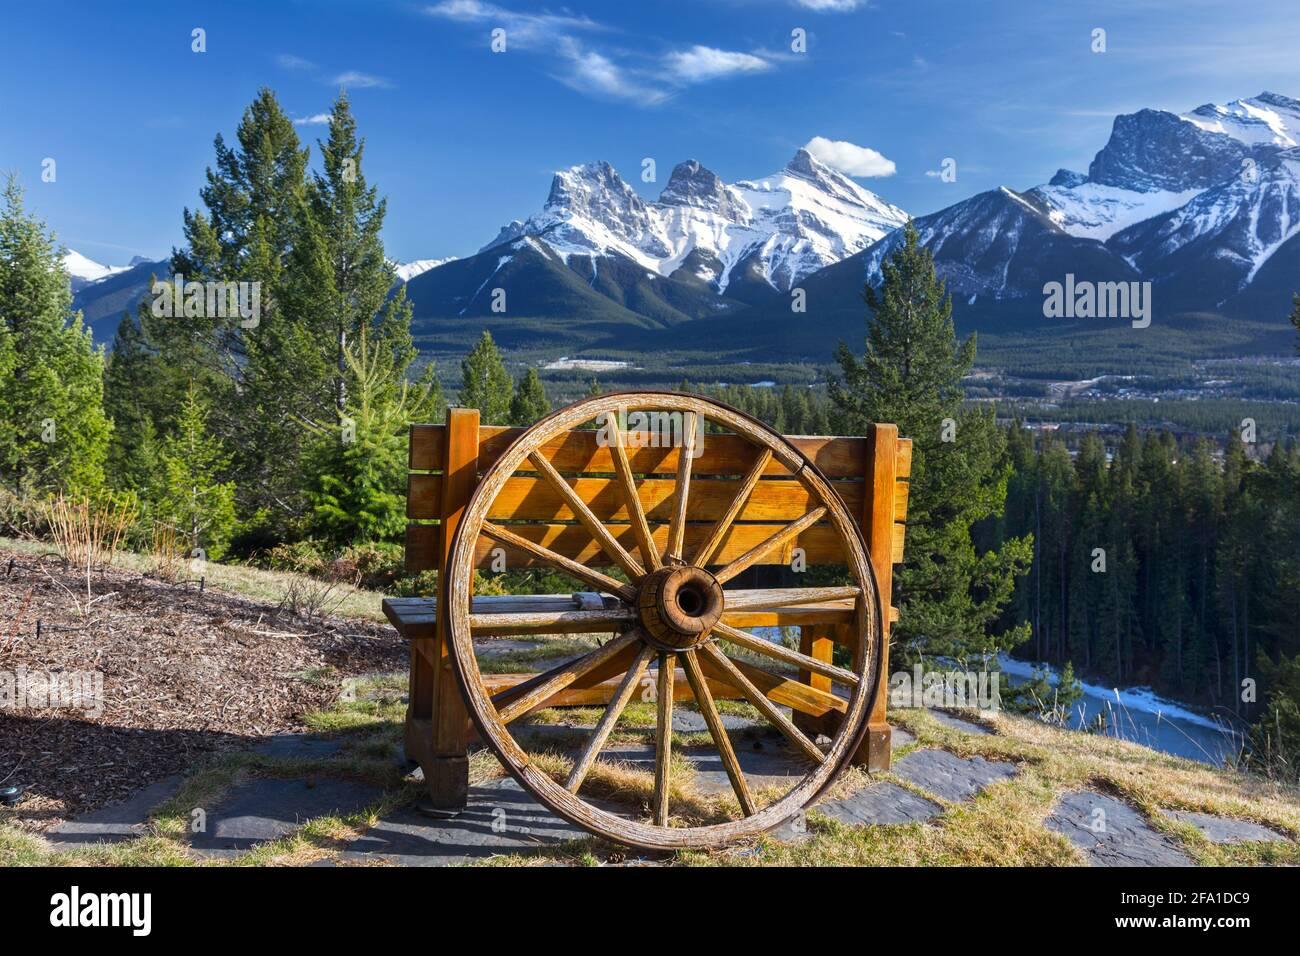 old-wooden-wagon-wheel-replica-picnic-be